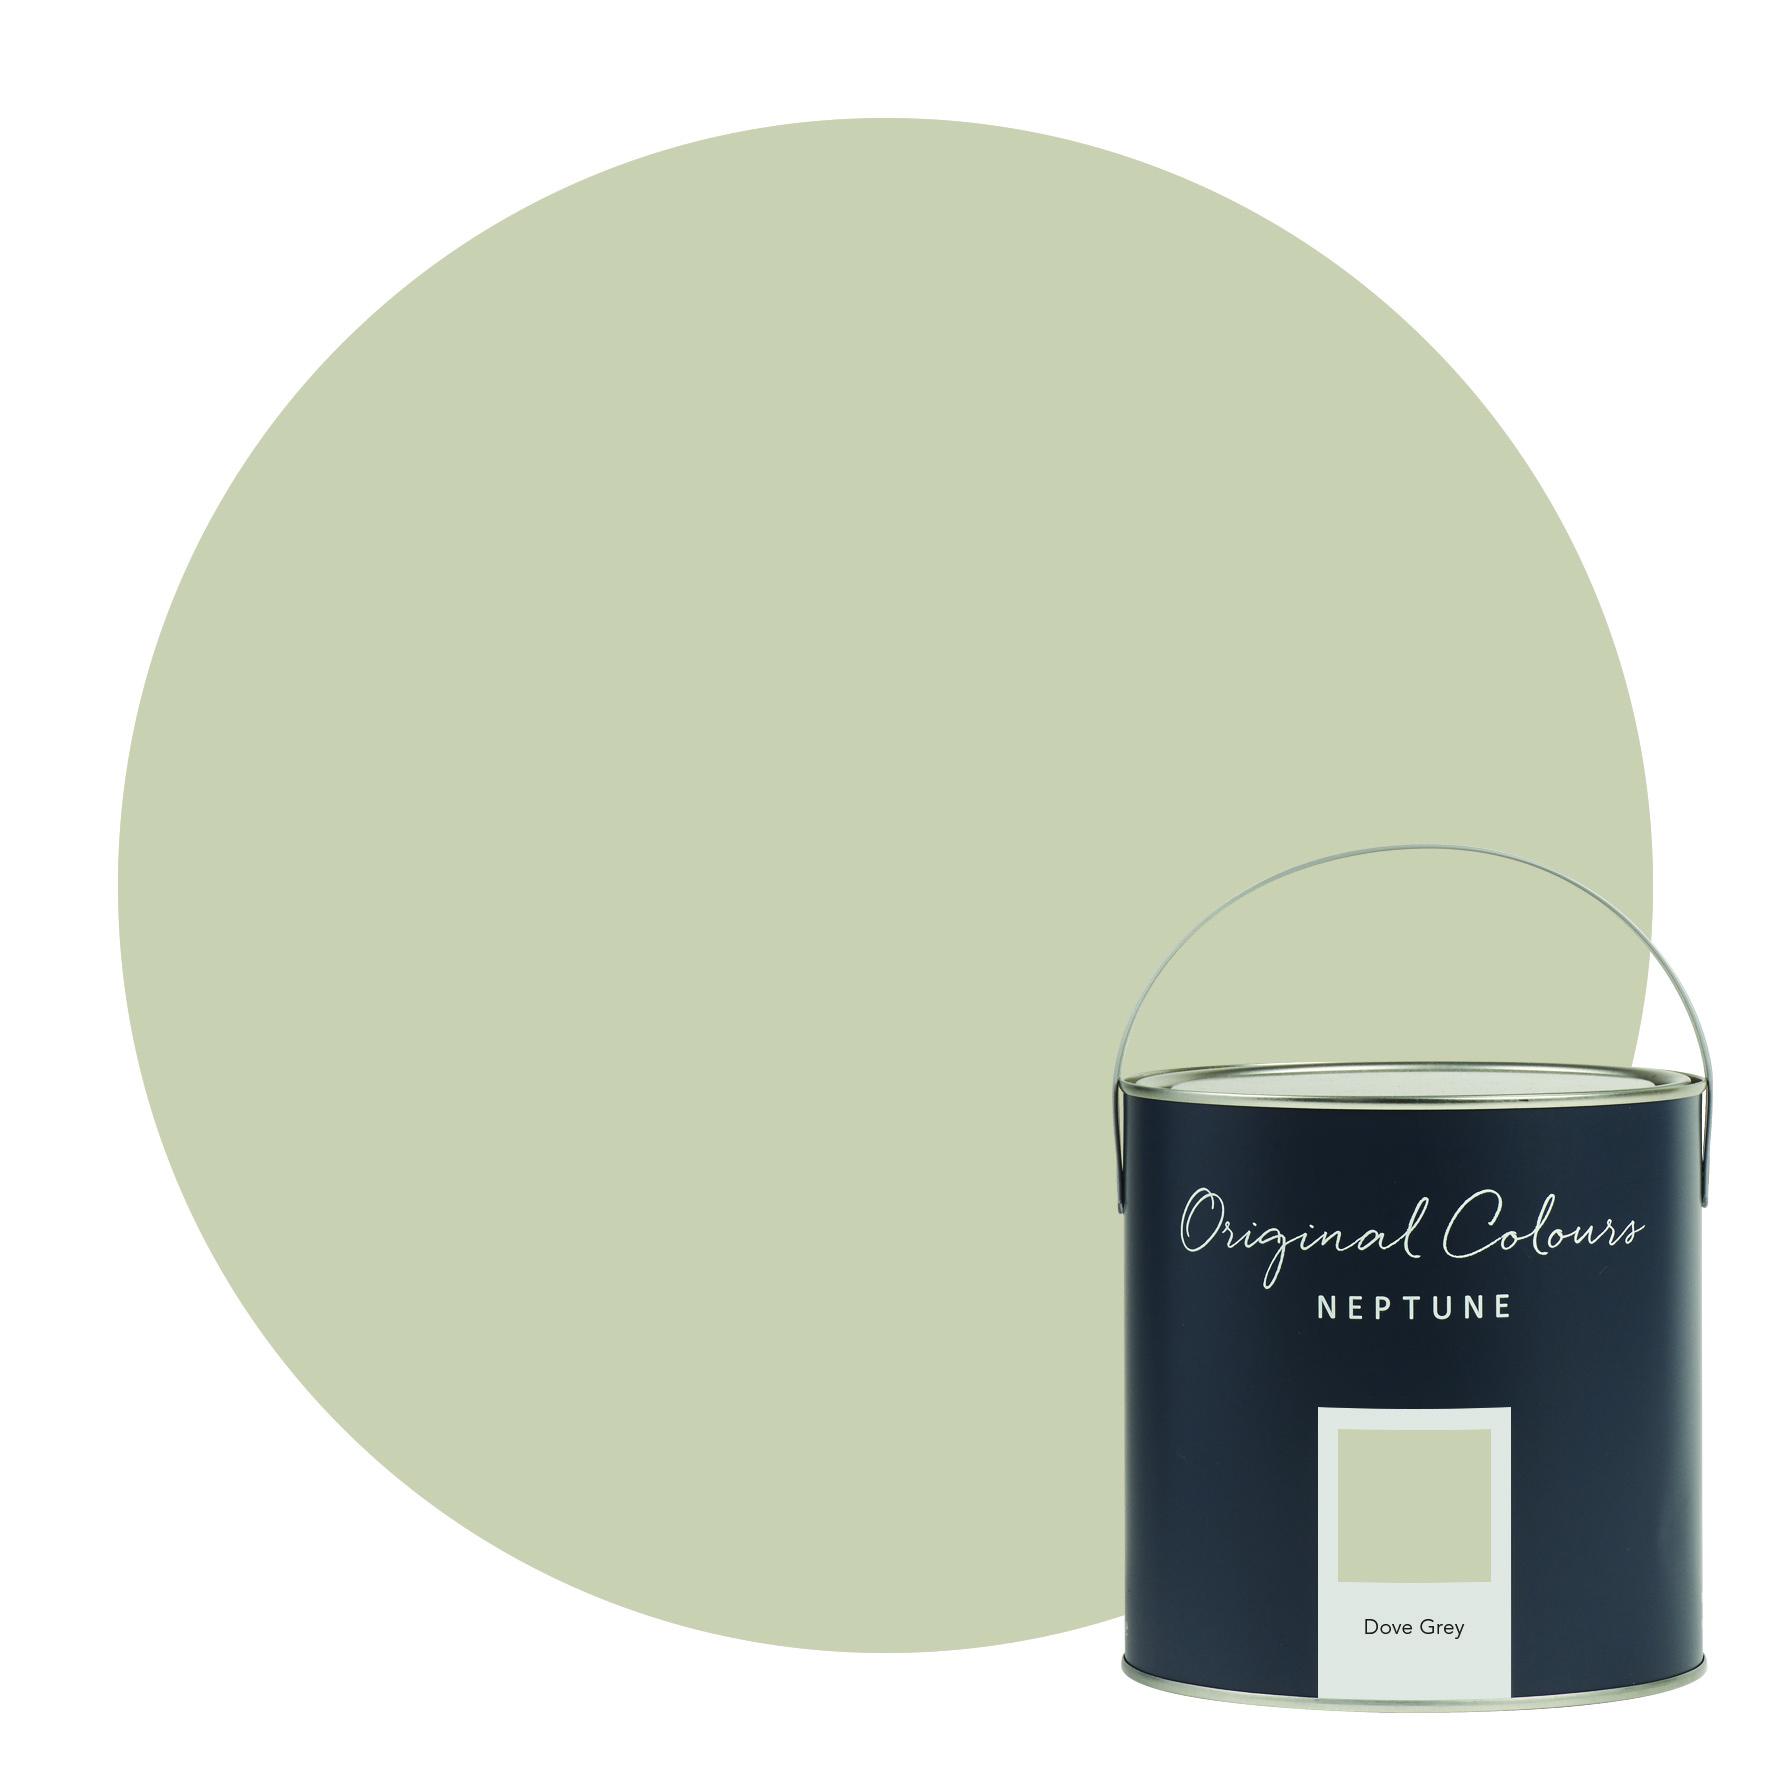 Amazing 1 Luxury - Amazing dove grey paint Inspirational